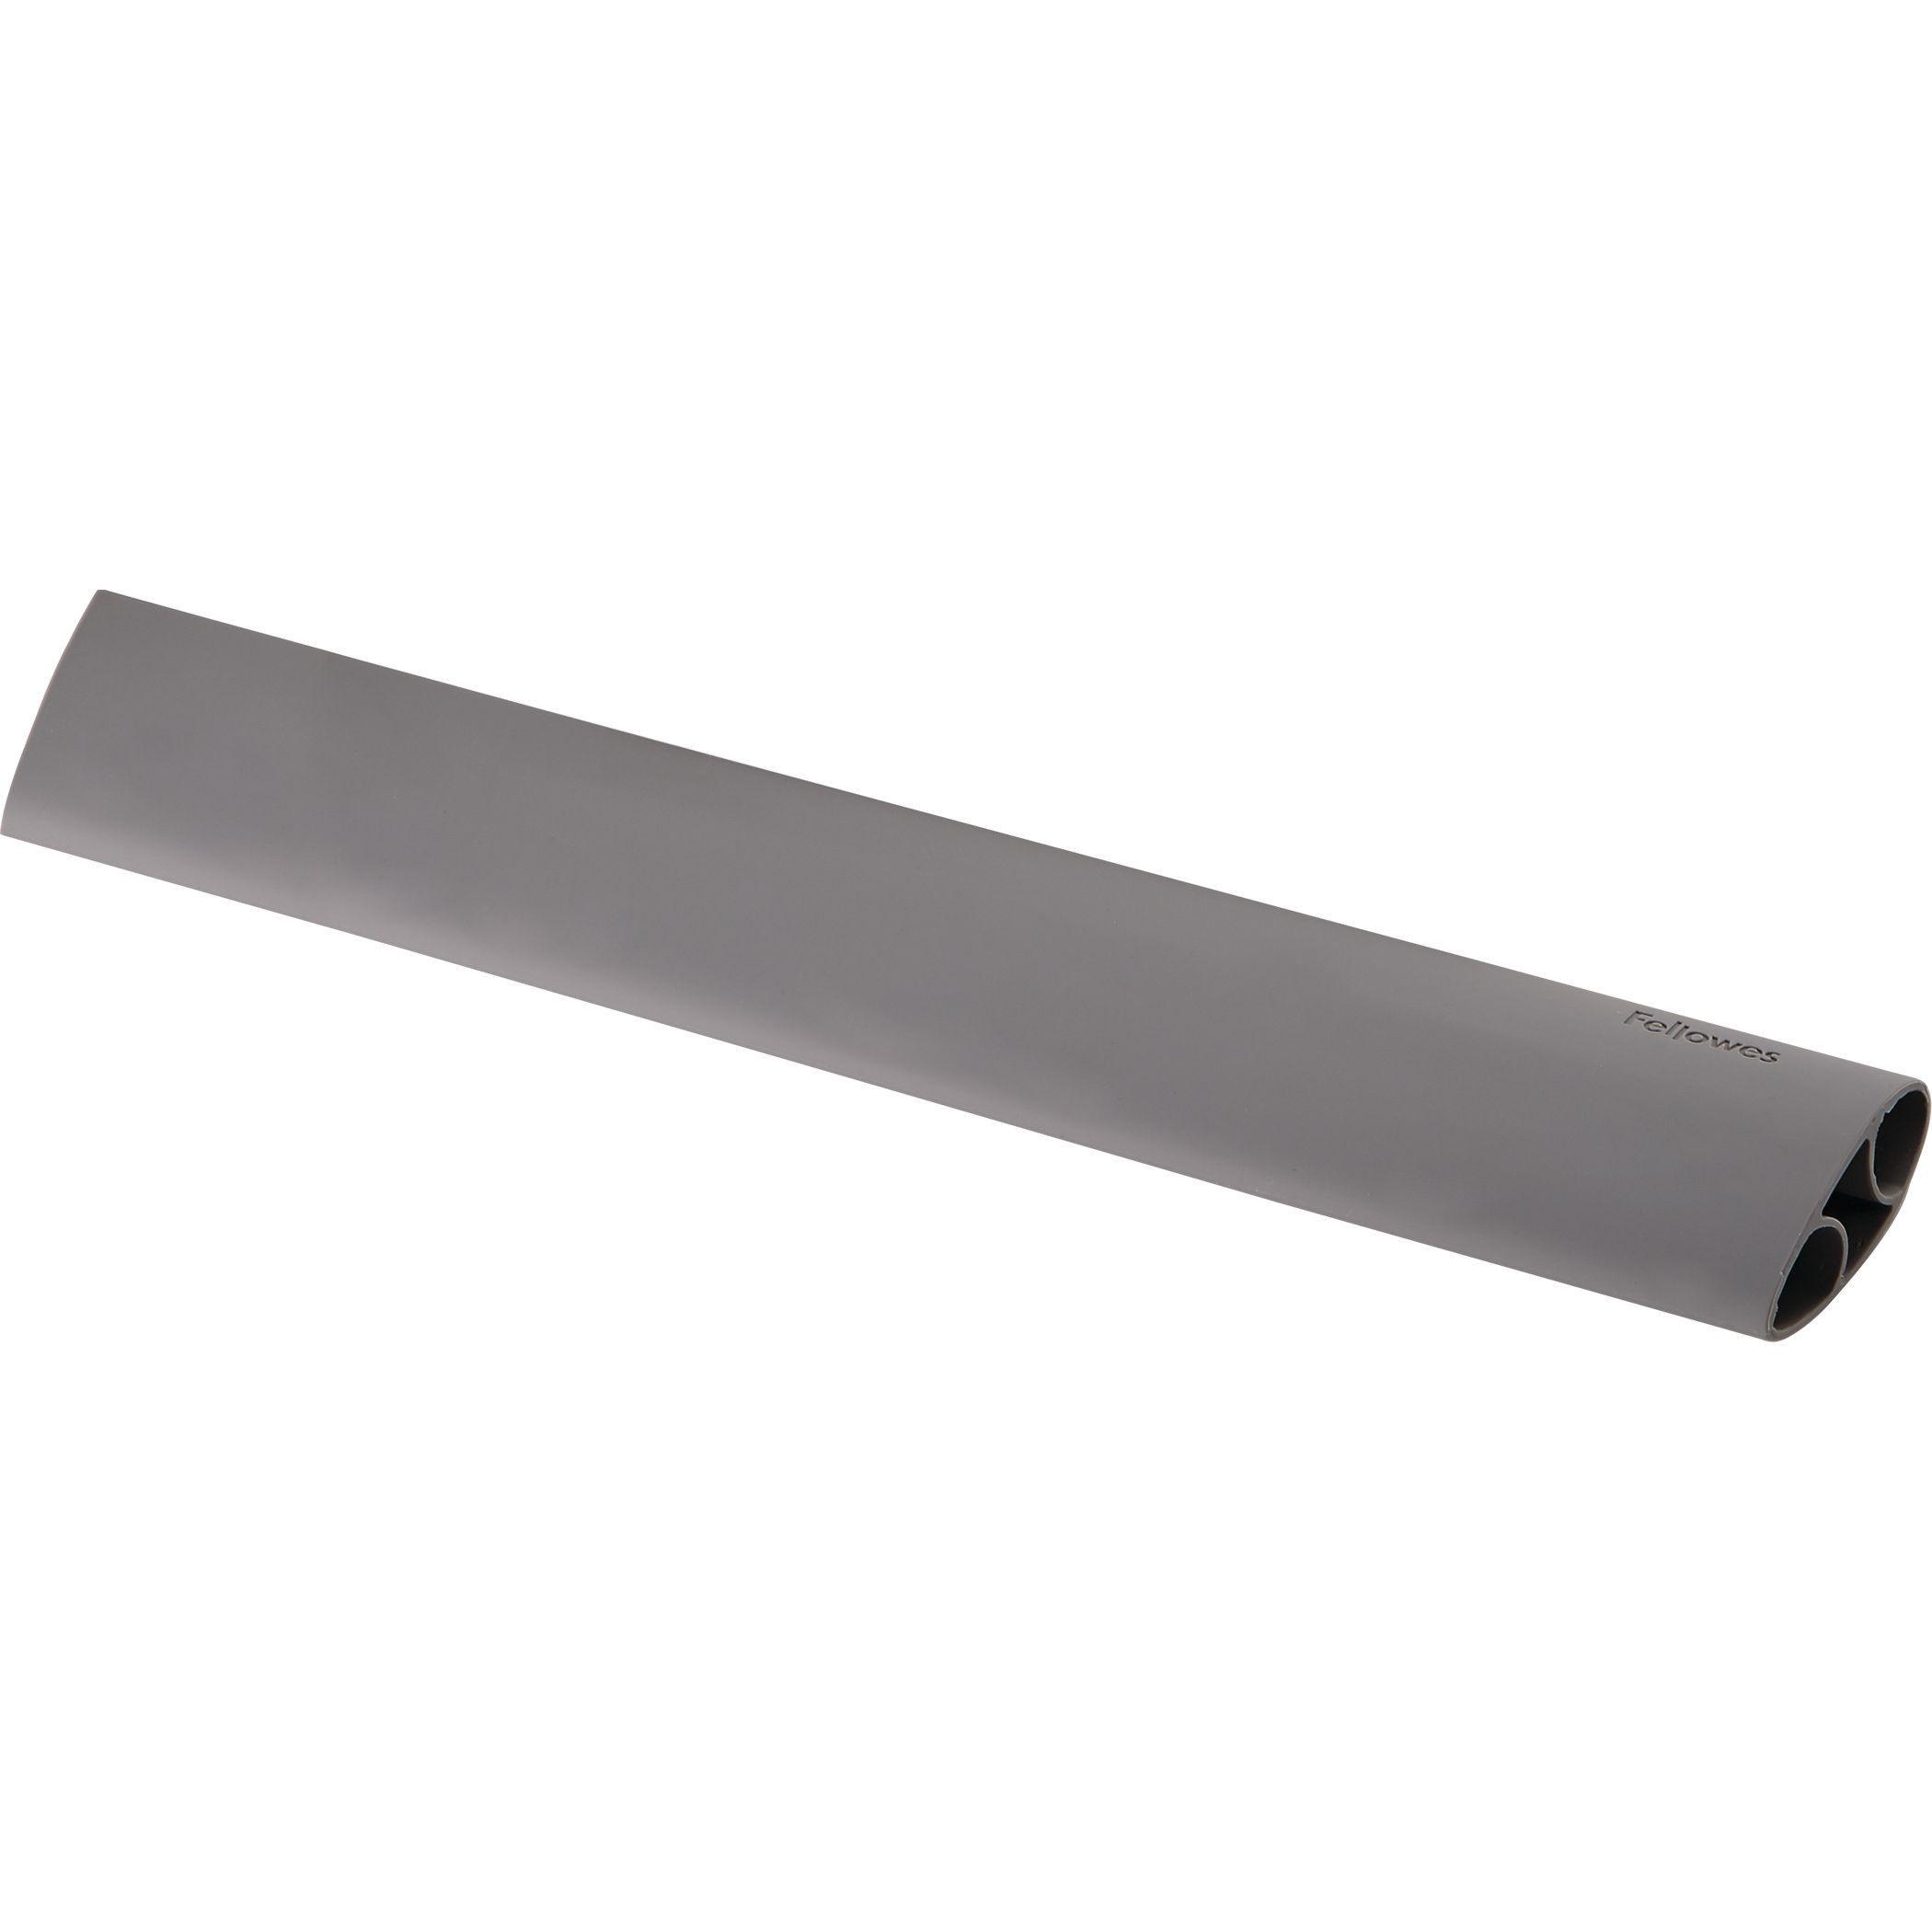 Fellowes I-Spire Series - Repose-poignets pour clavier - gris